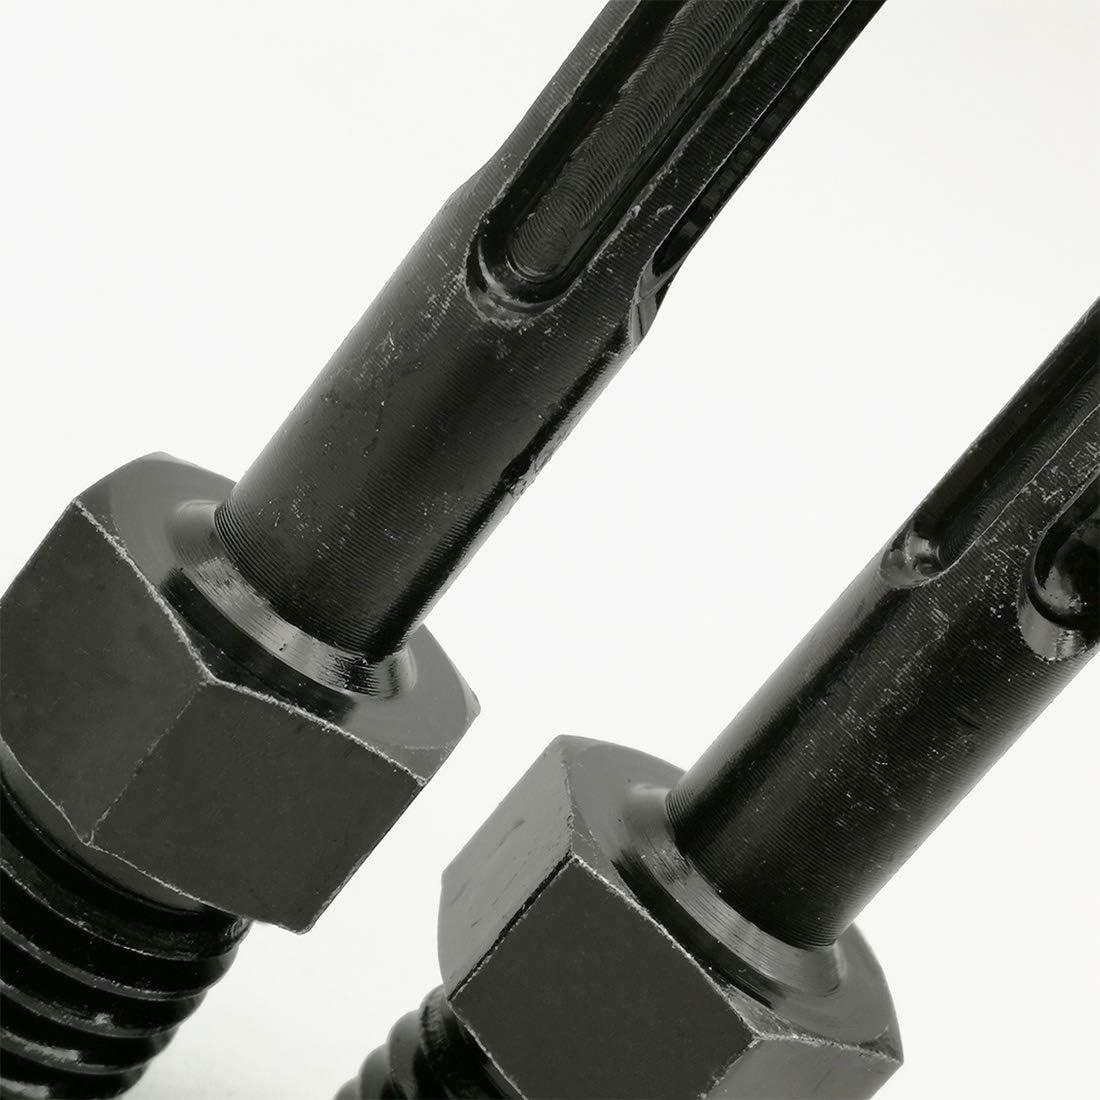 SHDIATOOL Core Drill Bit Adapter 5//8-11 Thread Male to SDS Plus Shank